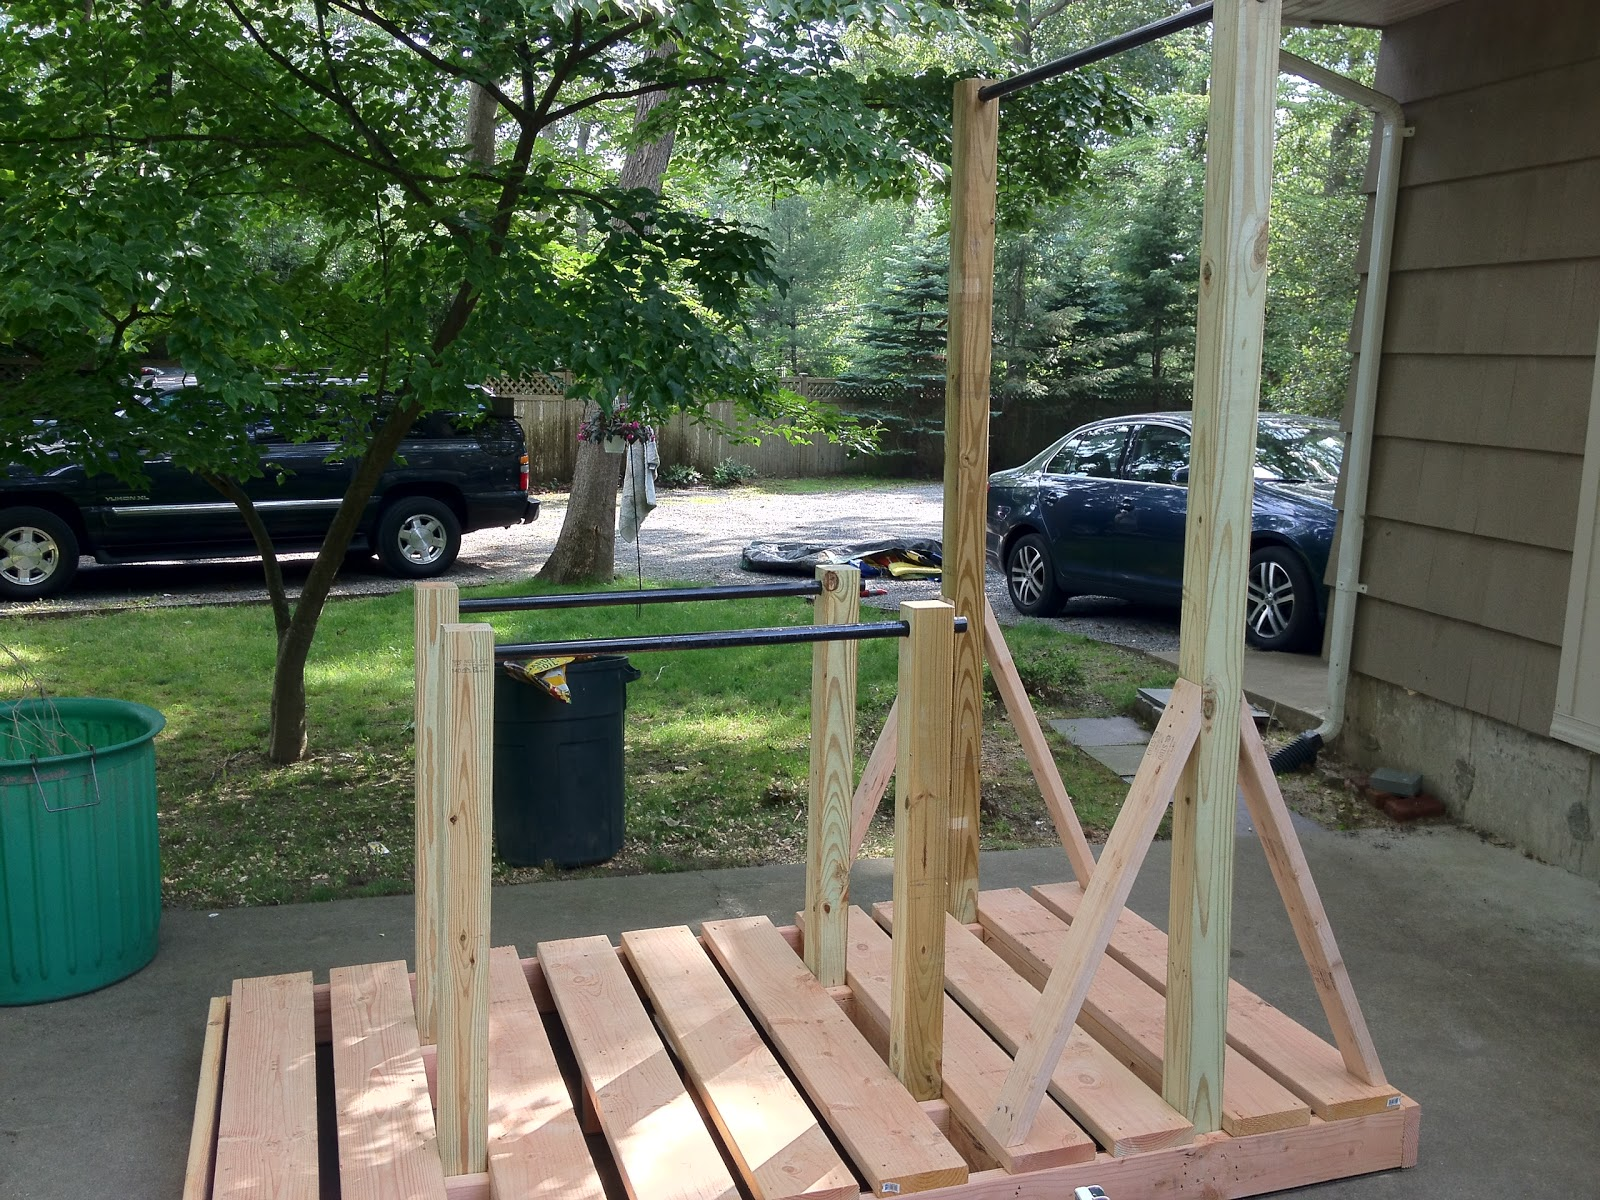 Back Yard pull up/dip station | DIY Crossfit | Pinterest ...